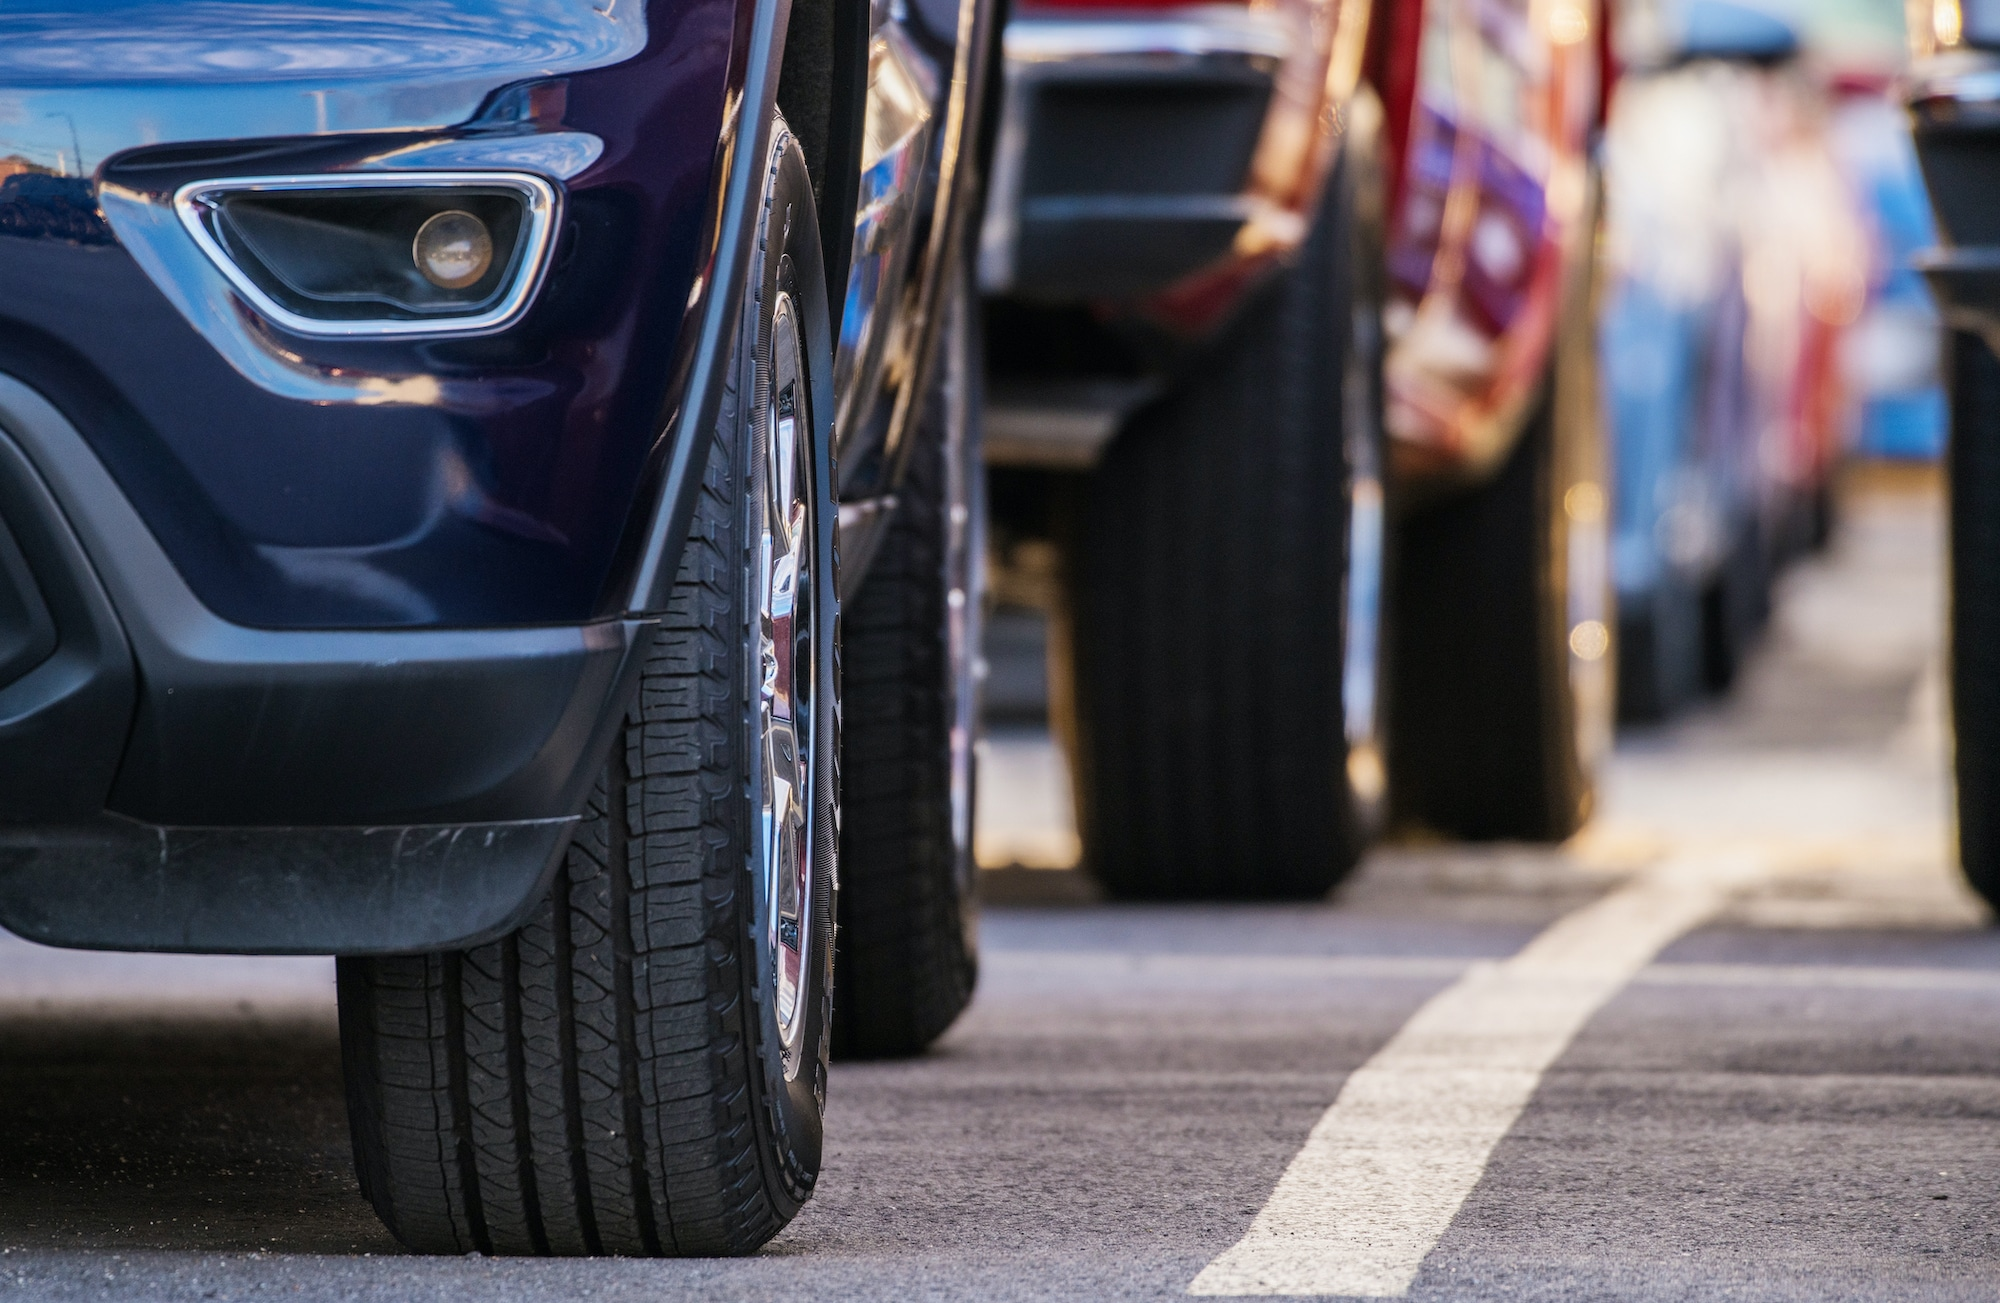 2020 Nissan Murano car recall injury lawsuit